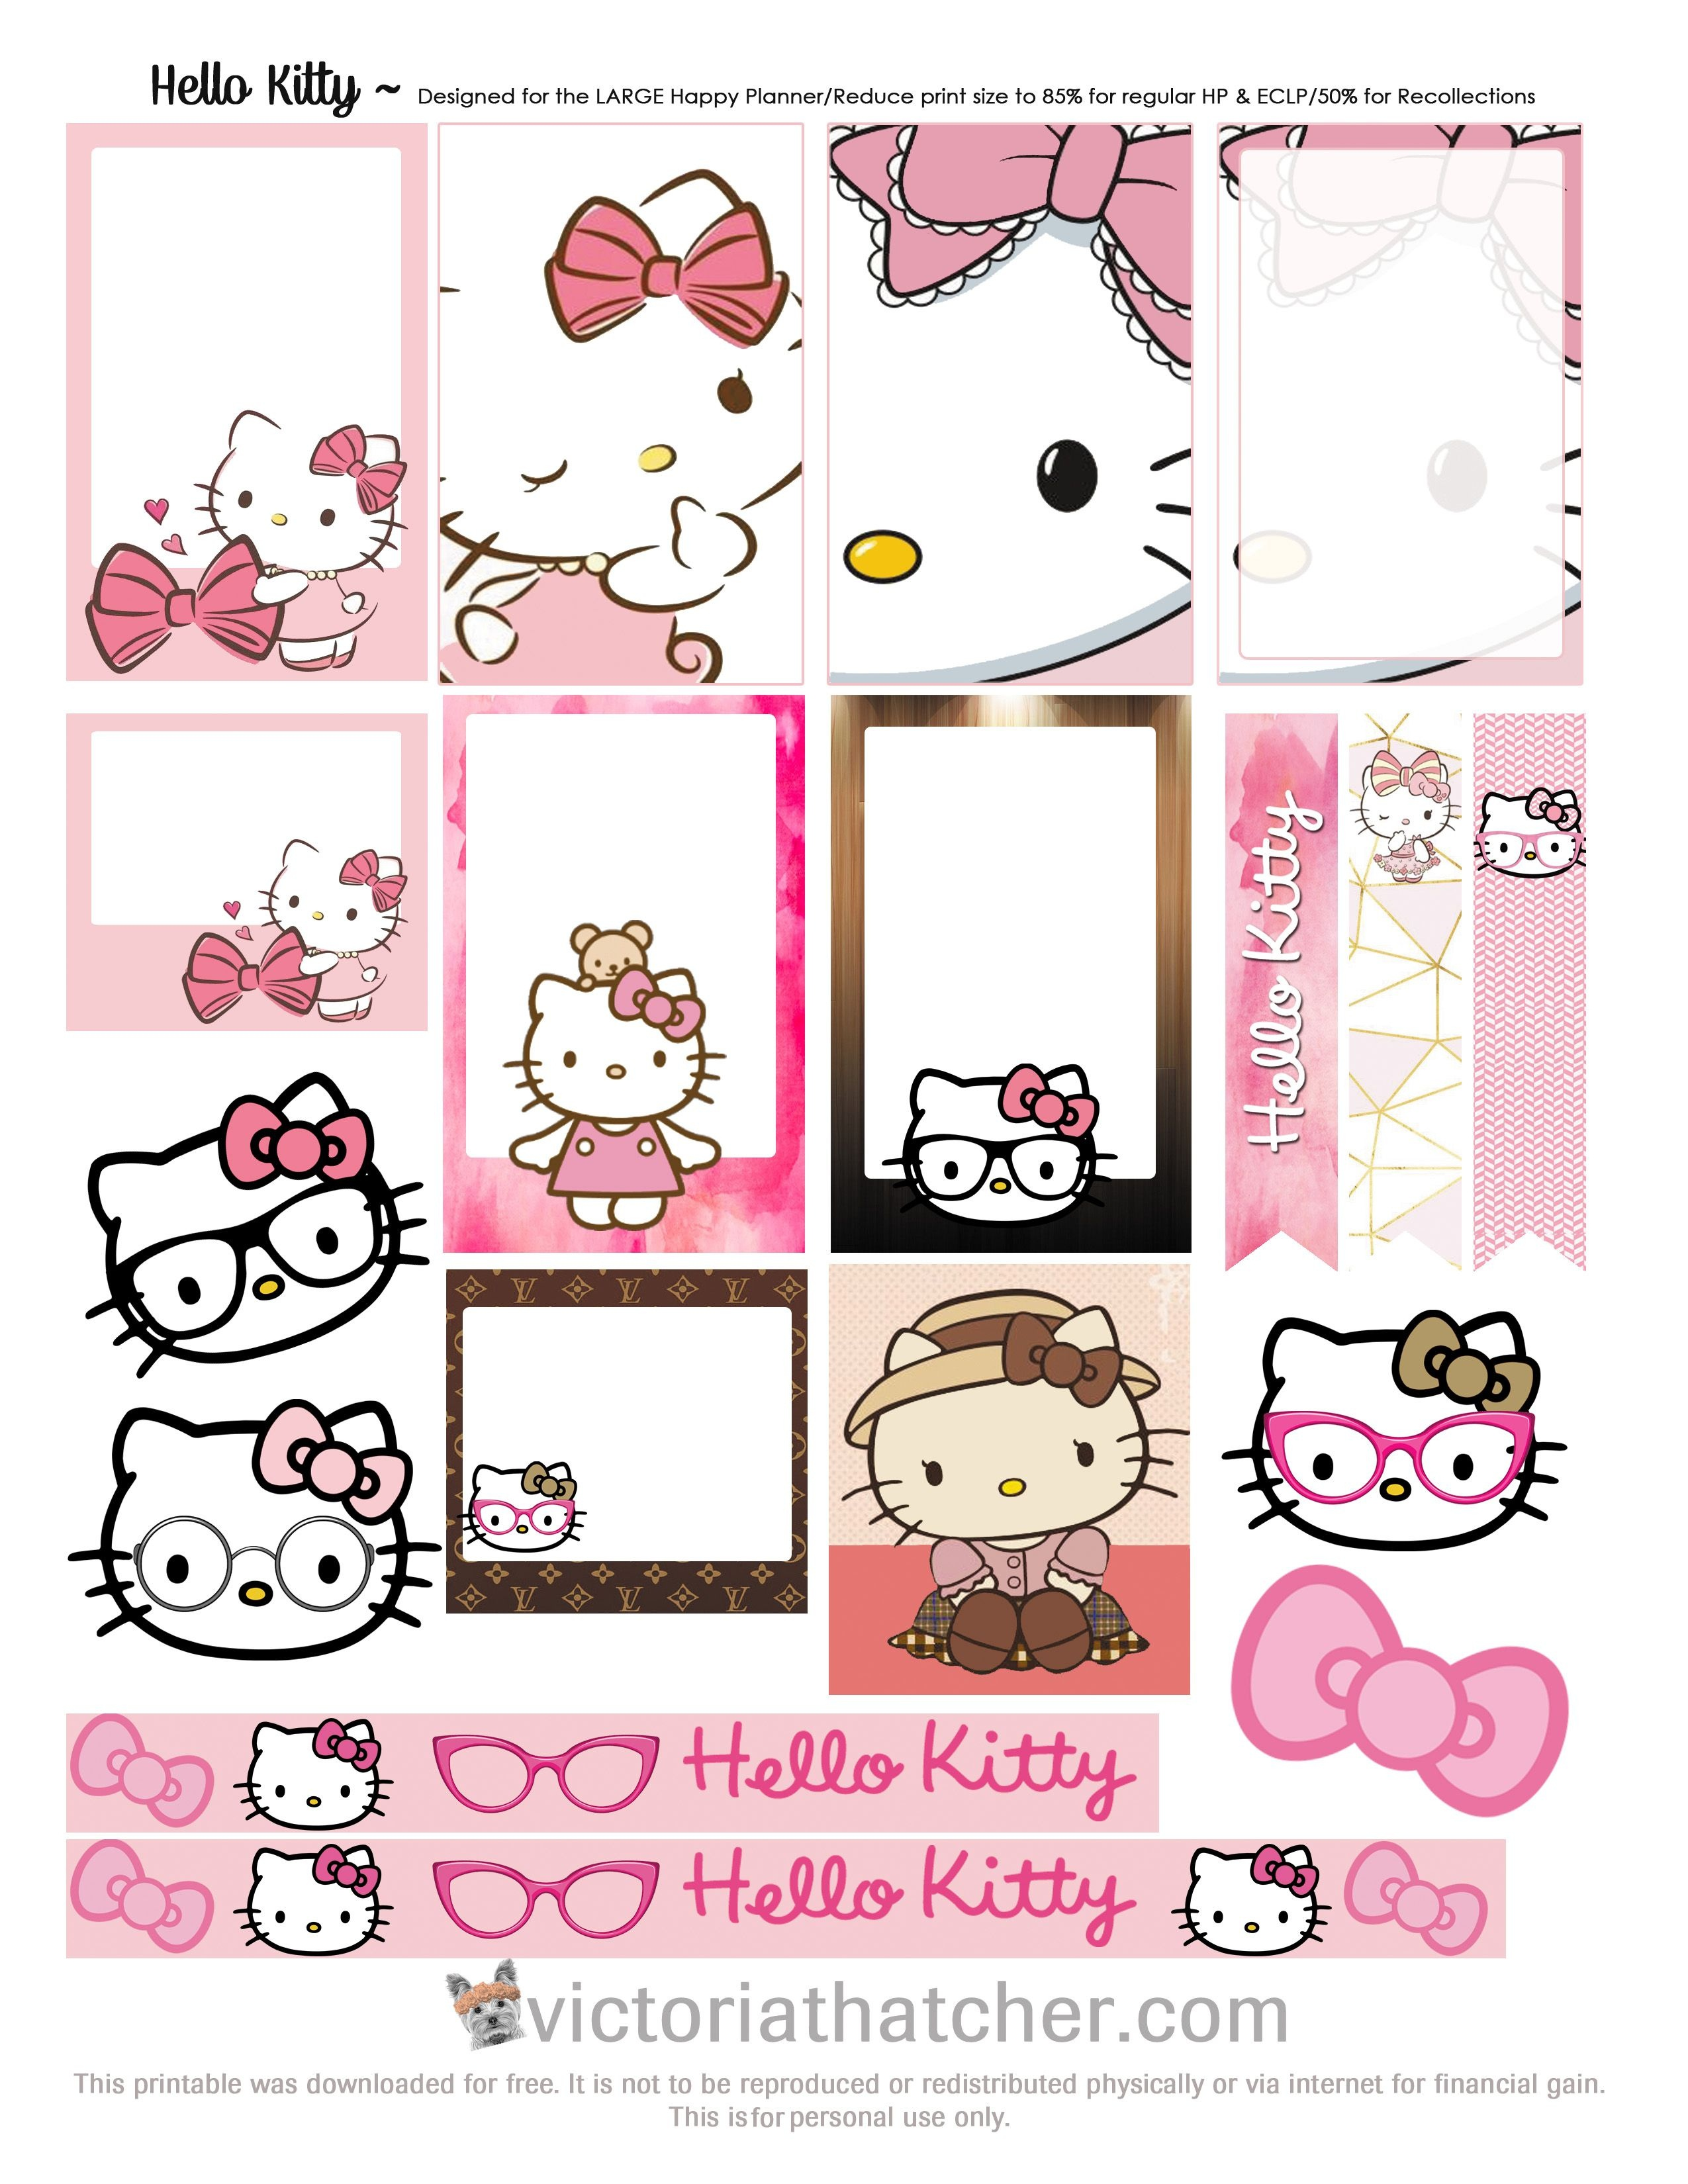 Free Printable Hello Kitty Planner Stickers From Victoria Thatcher - Hello Kitty Name Tags Printable Free